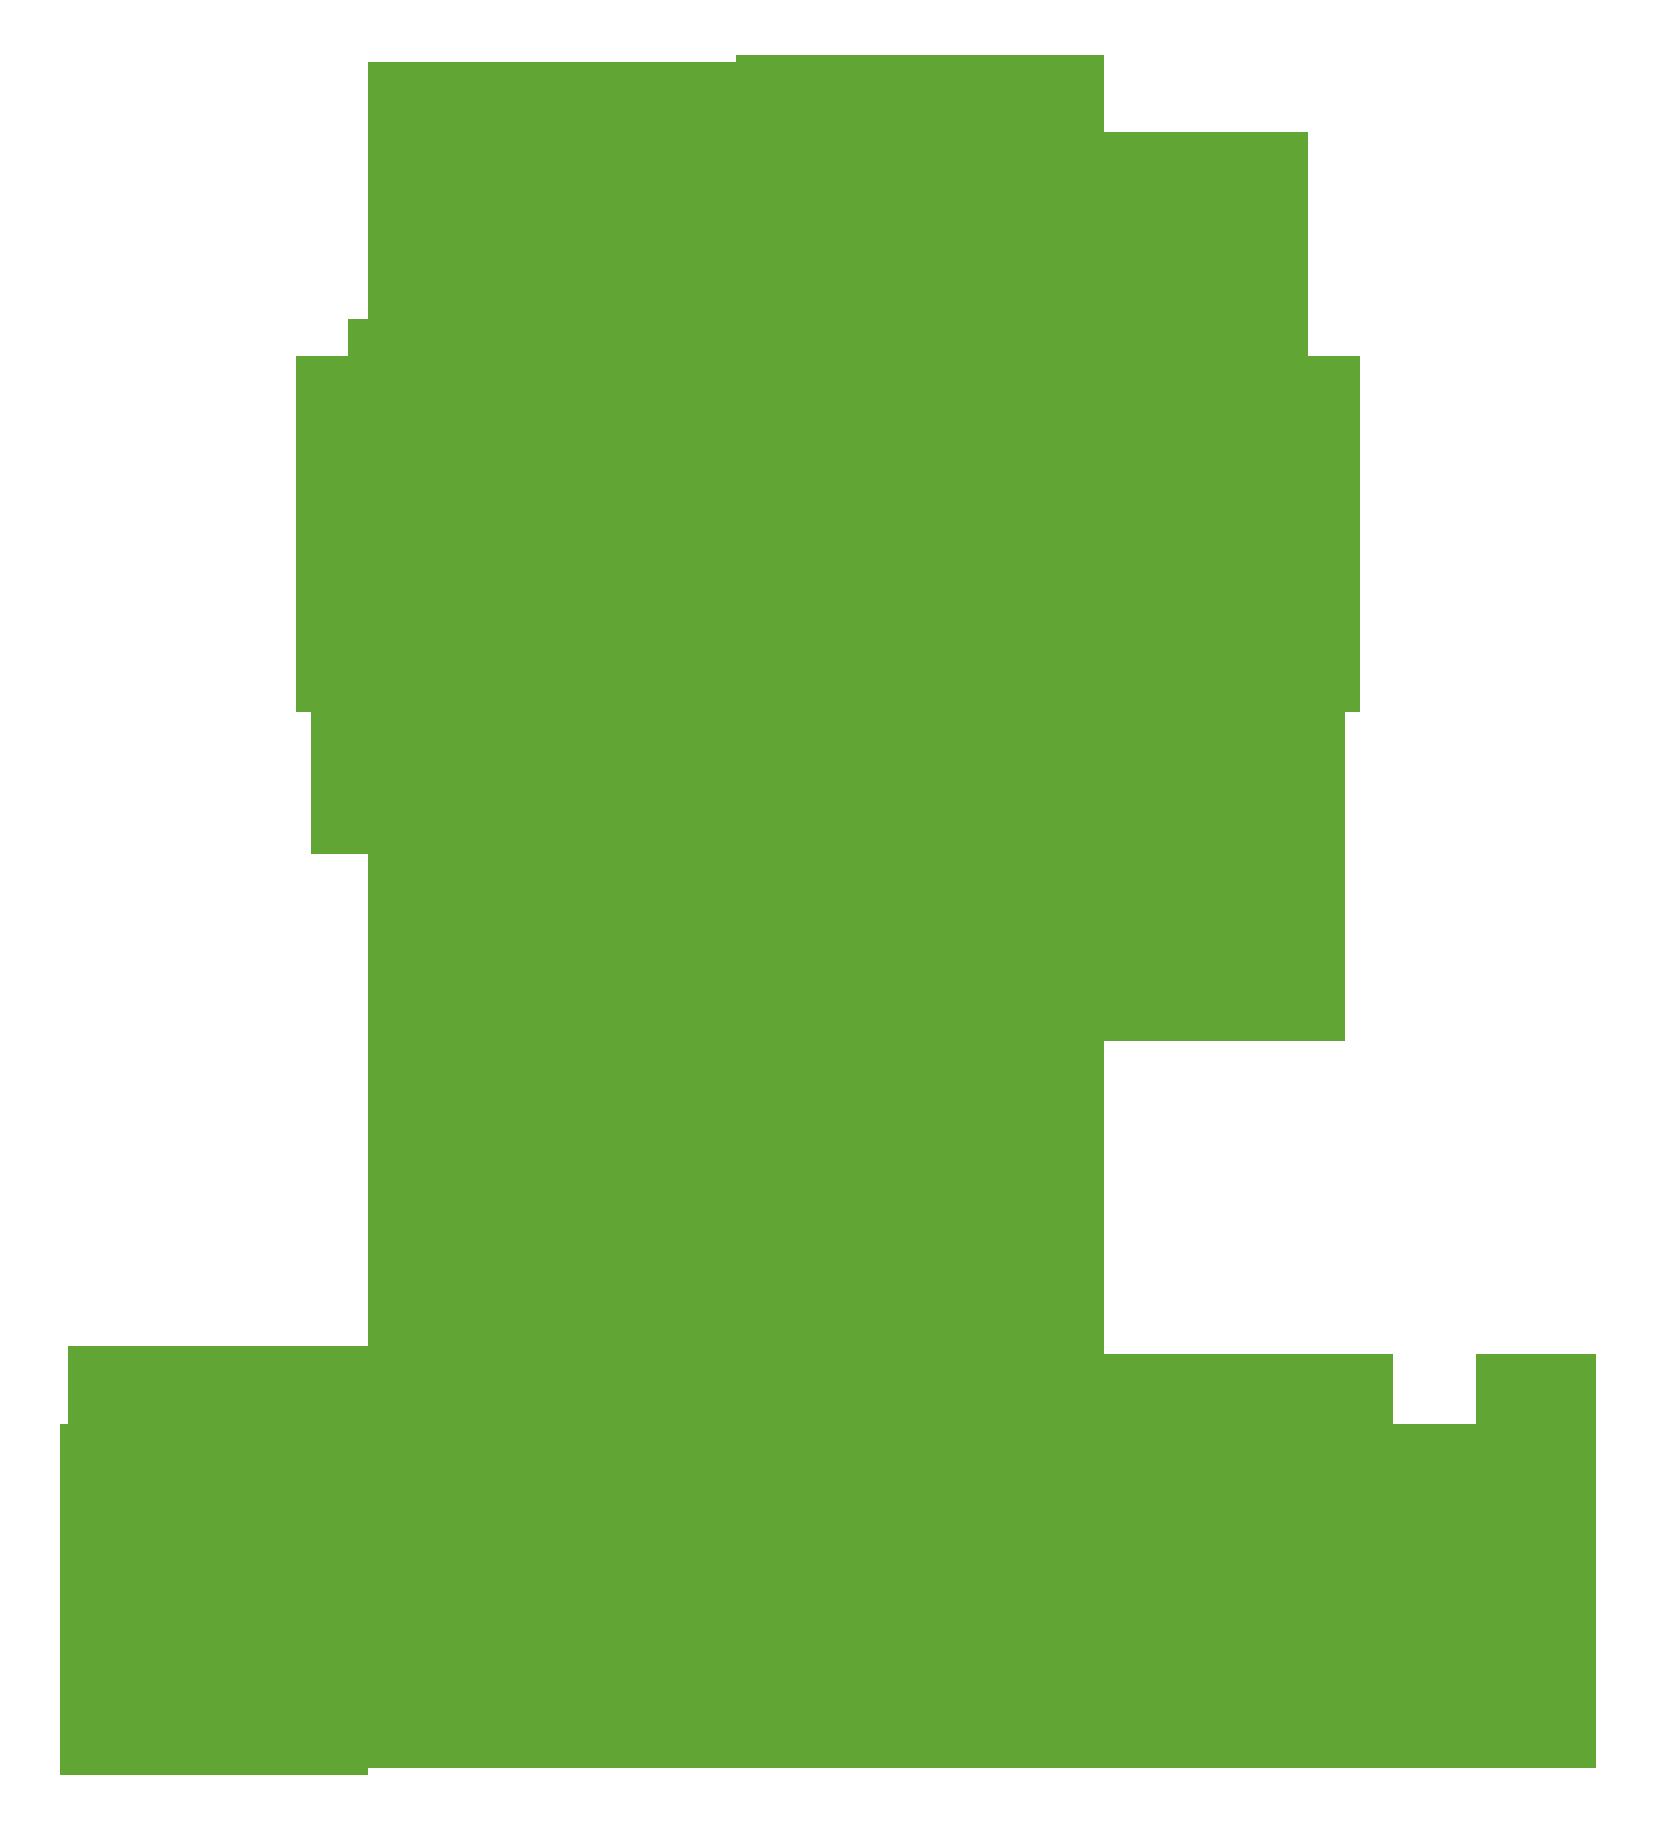 oxfam_vertical_color_rgb_0_002.png